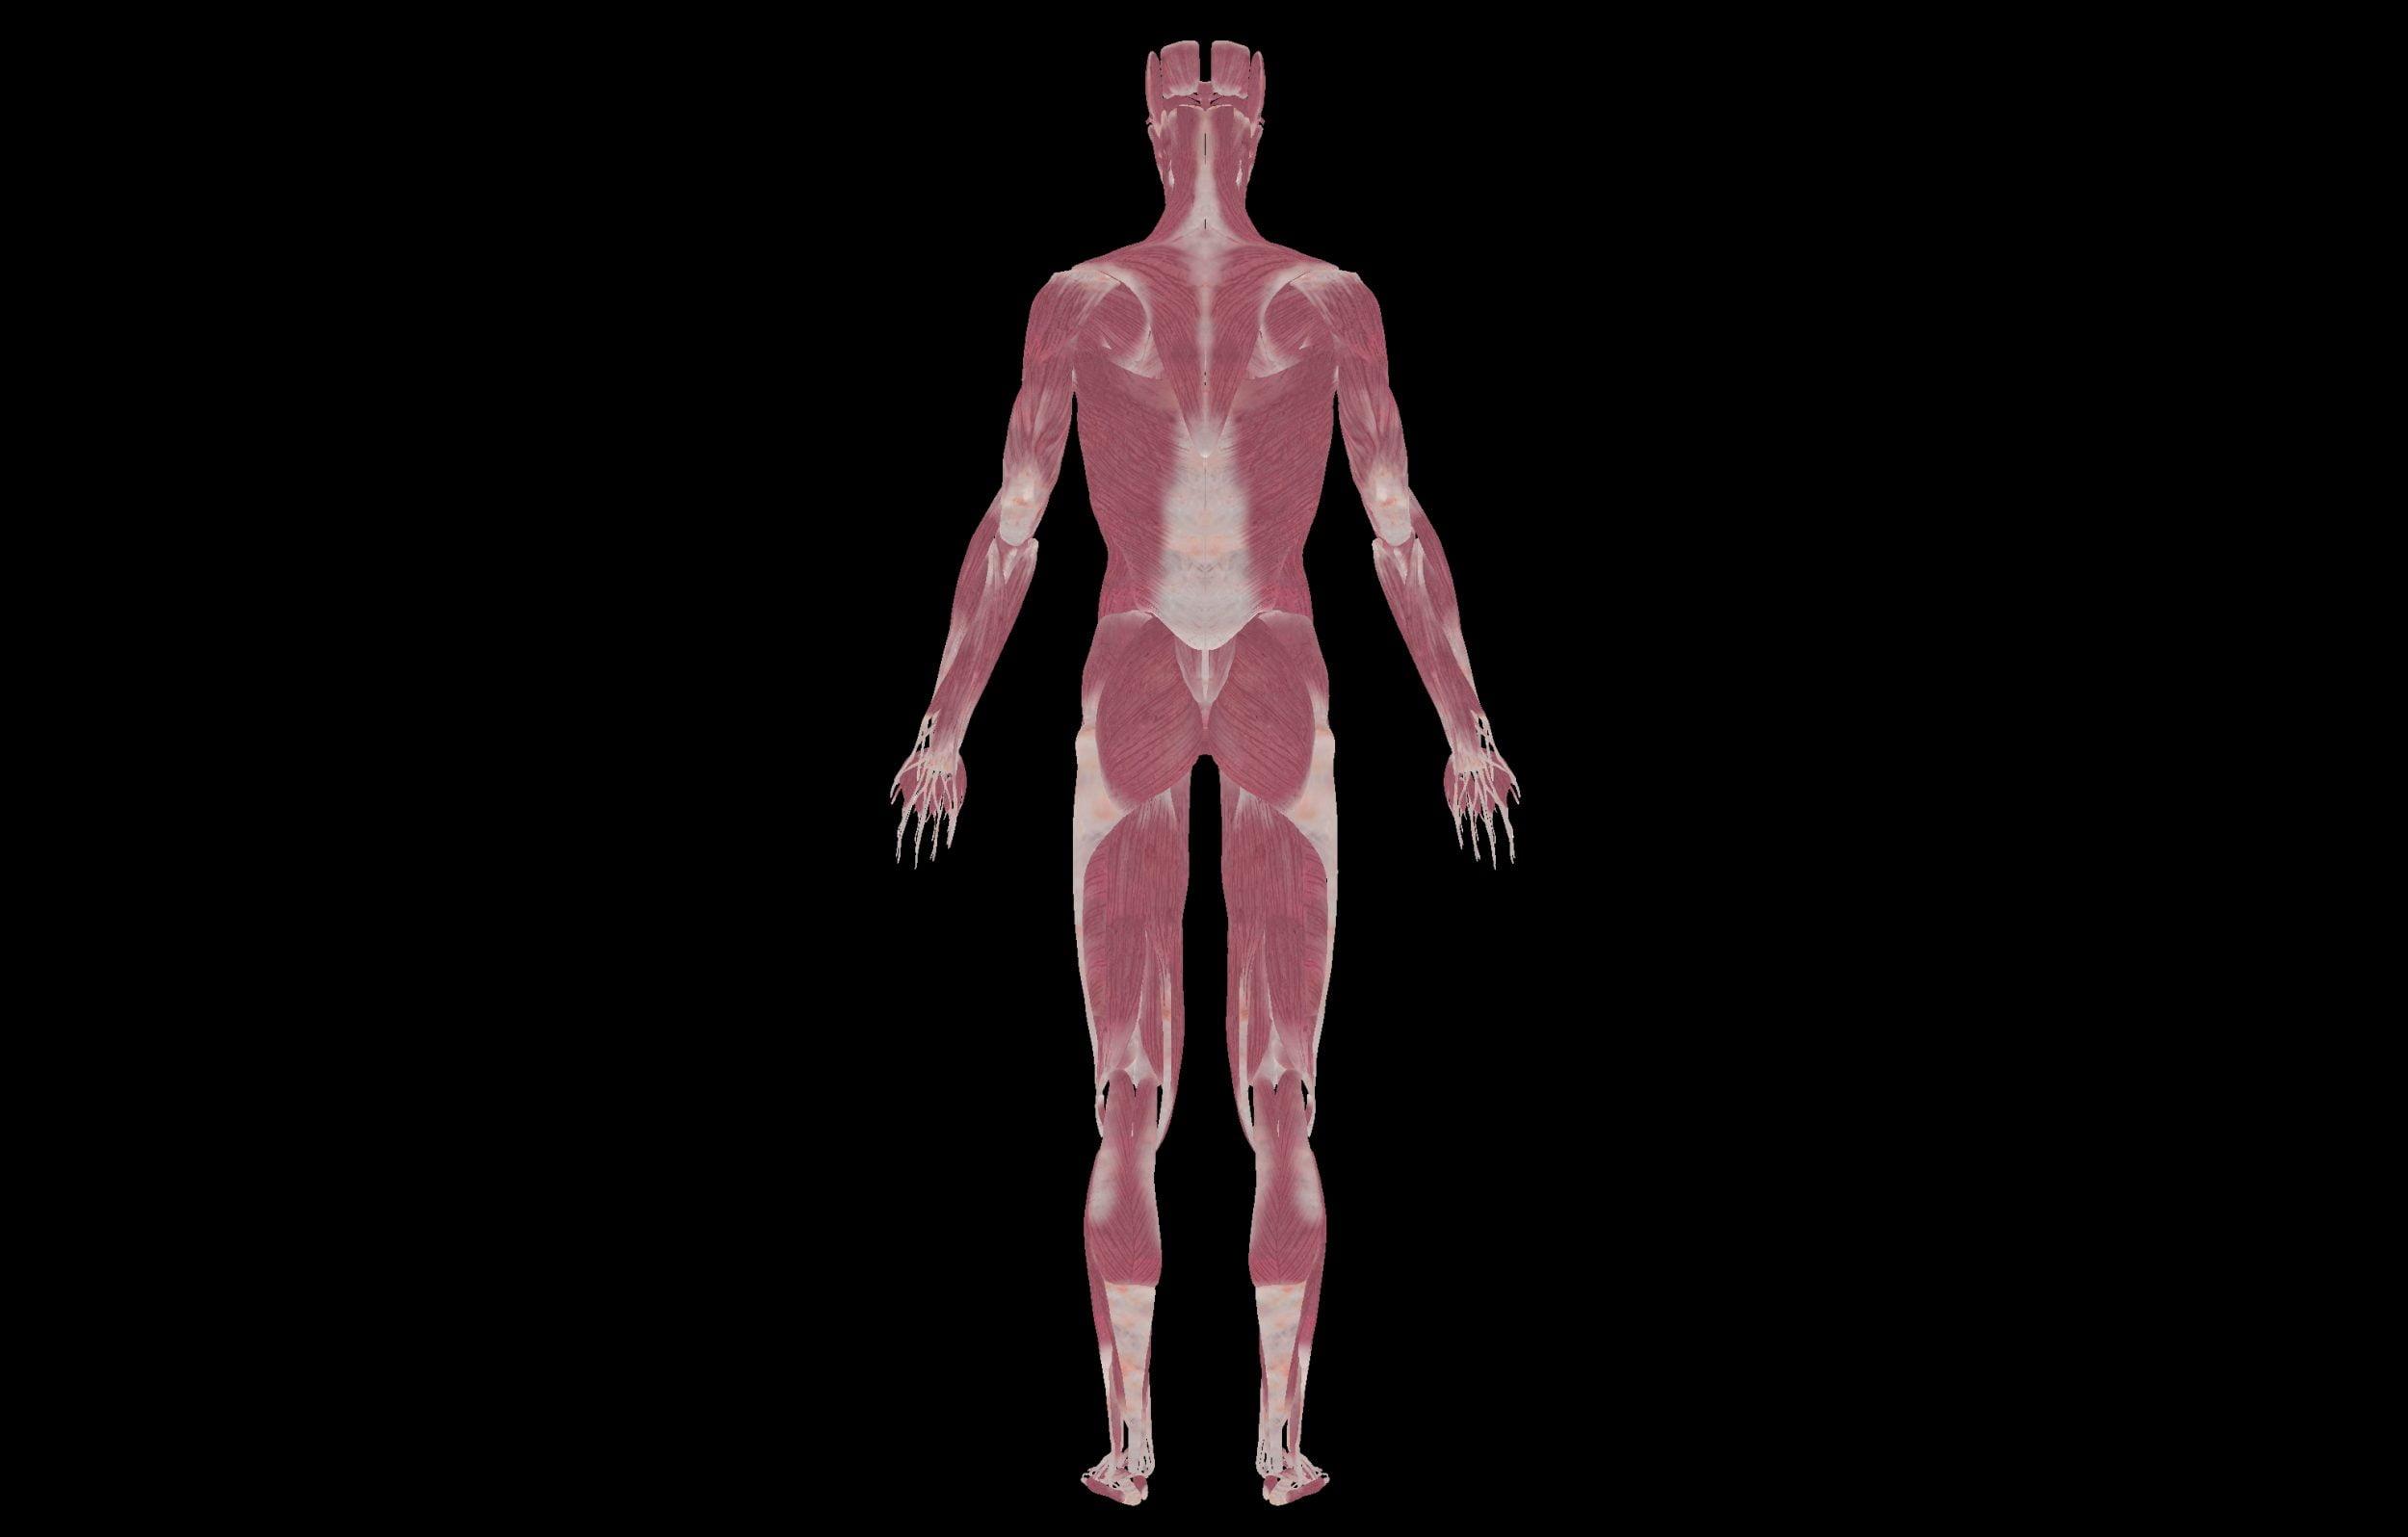 7 3 scaled SA Anatomy | Study Anatomy in 3D